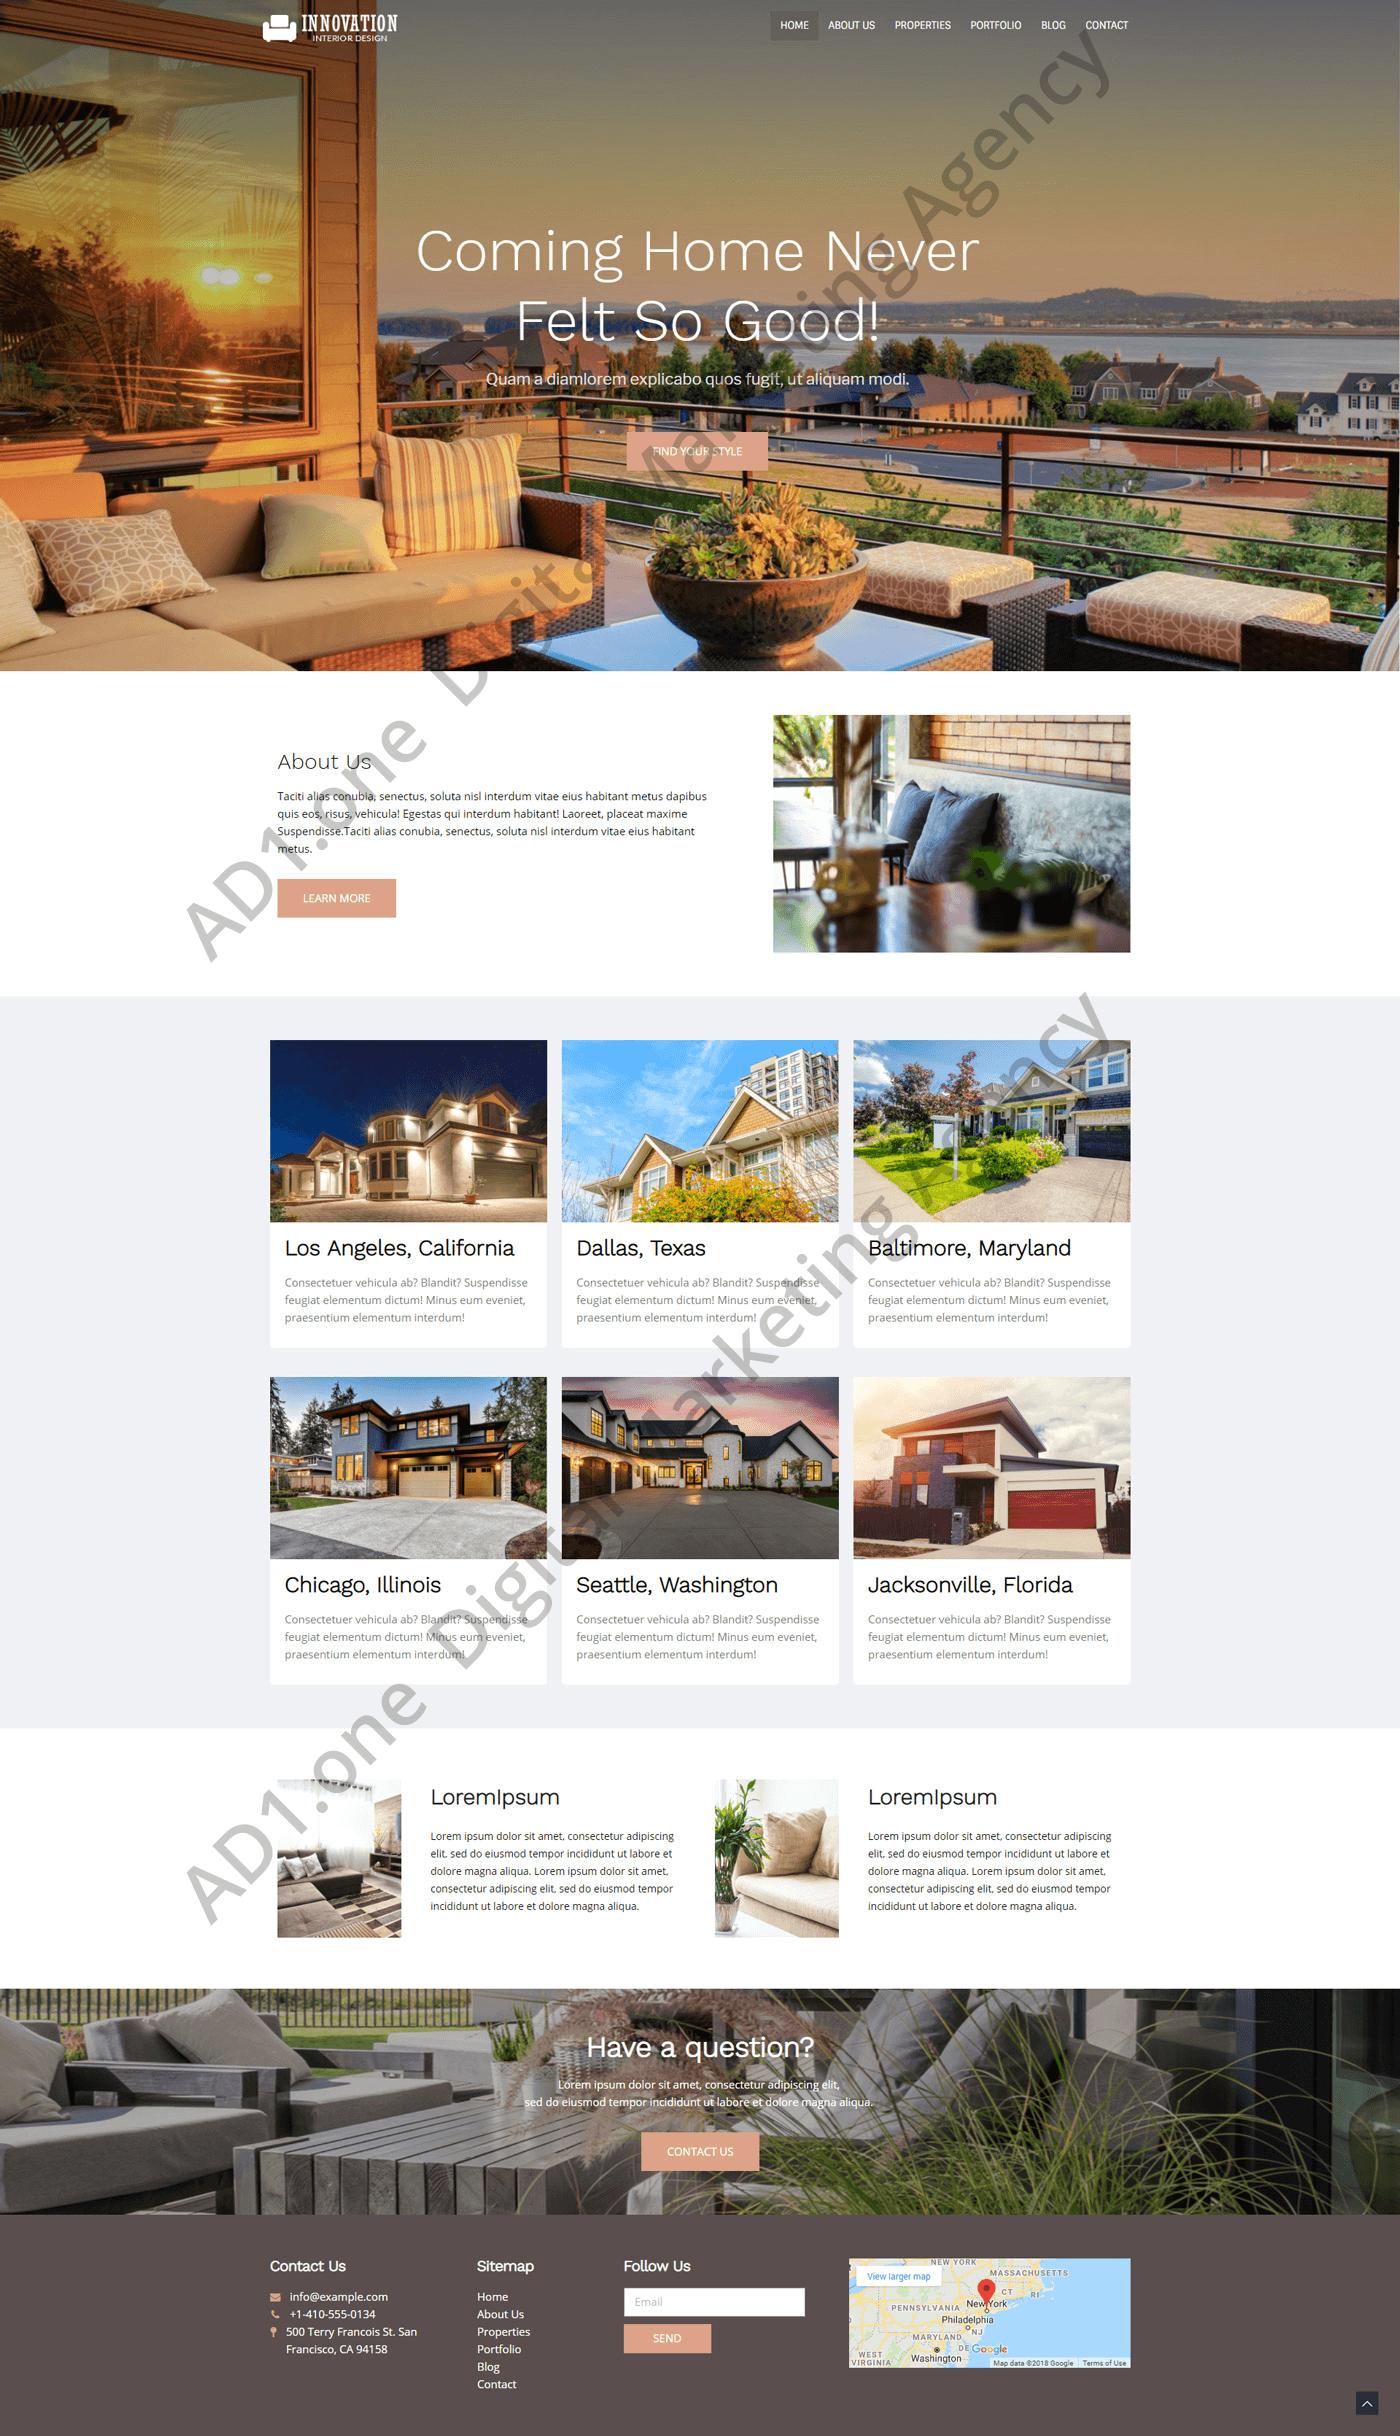 Palo Alto- ad1 agency website desing Real Estate project